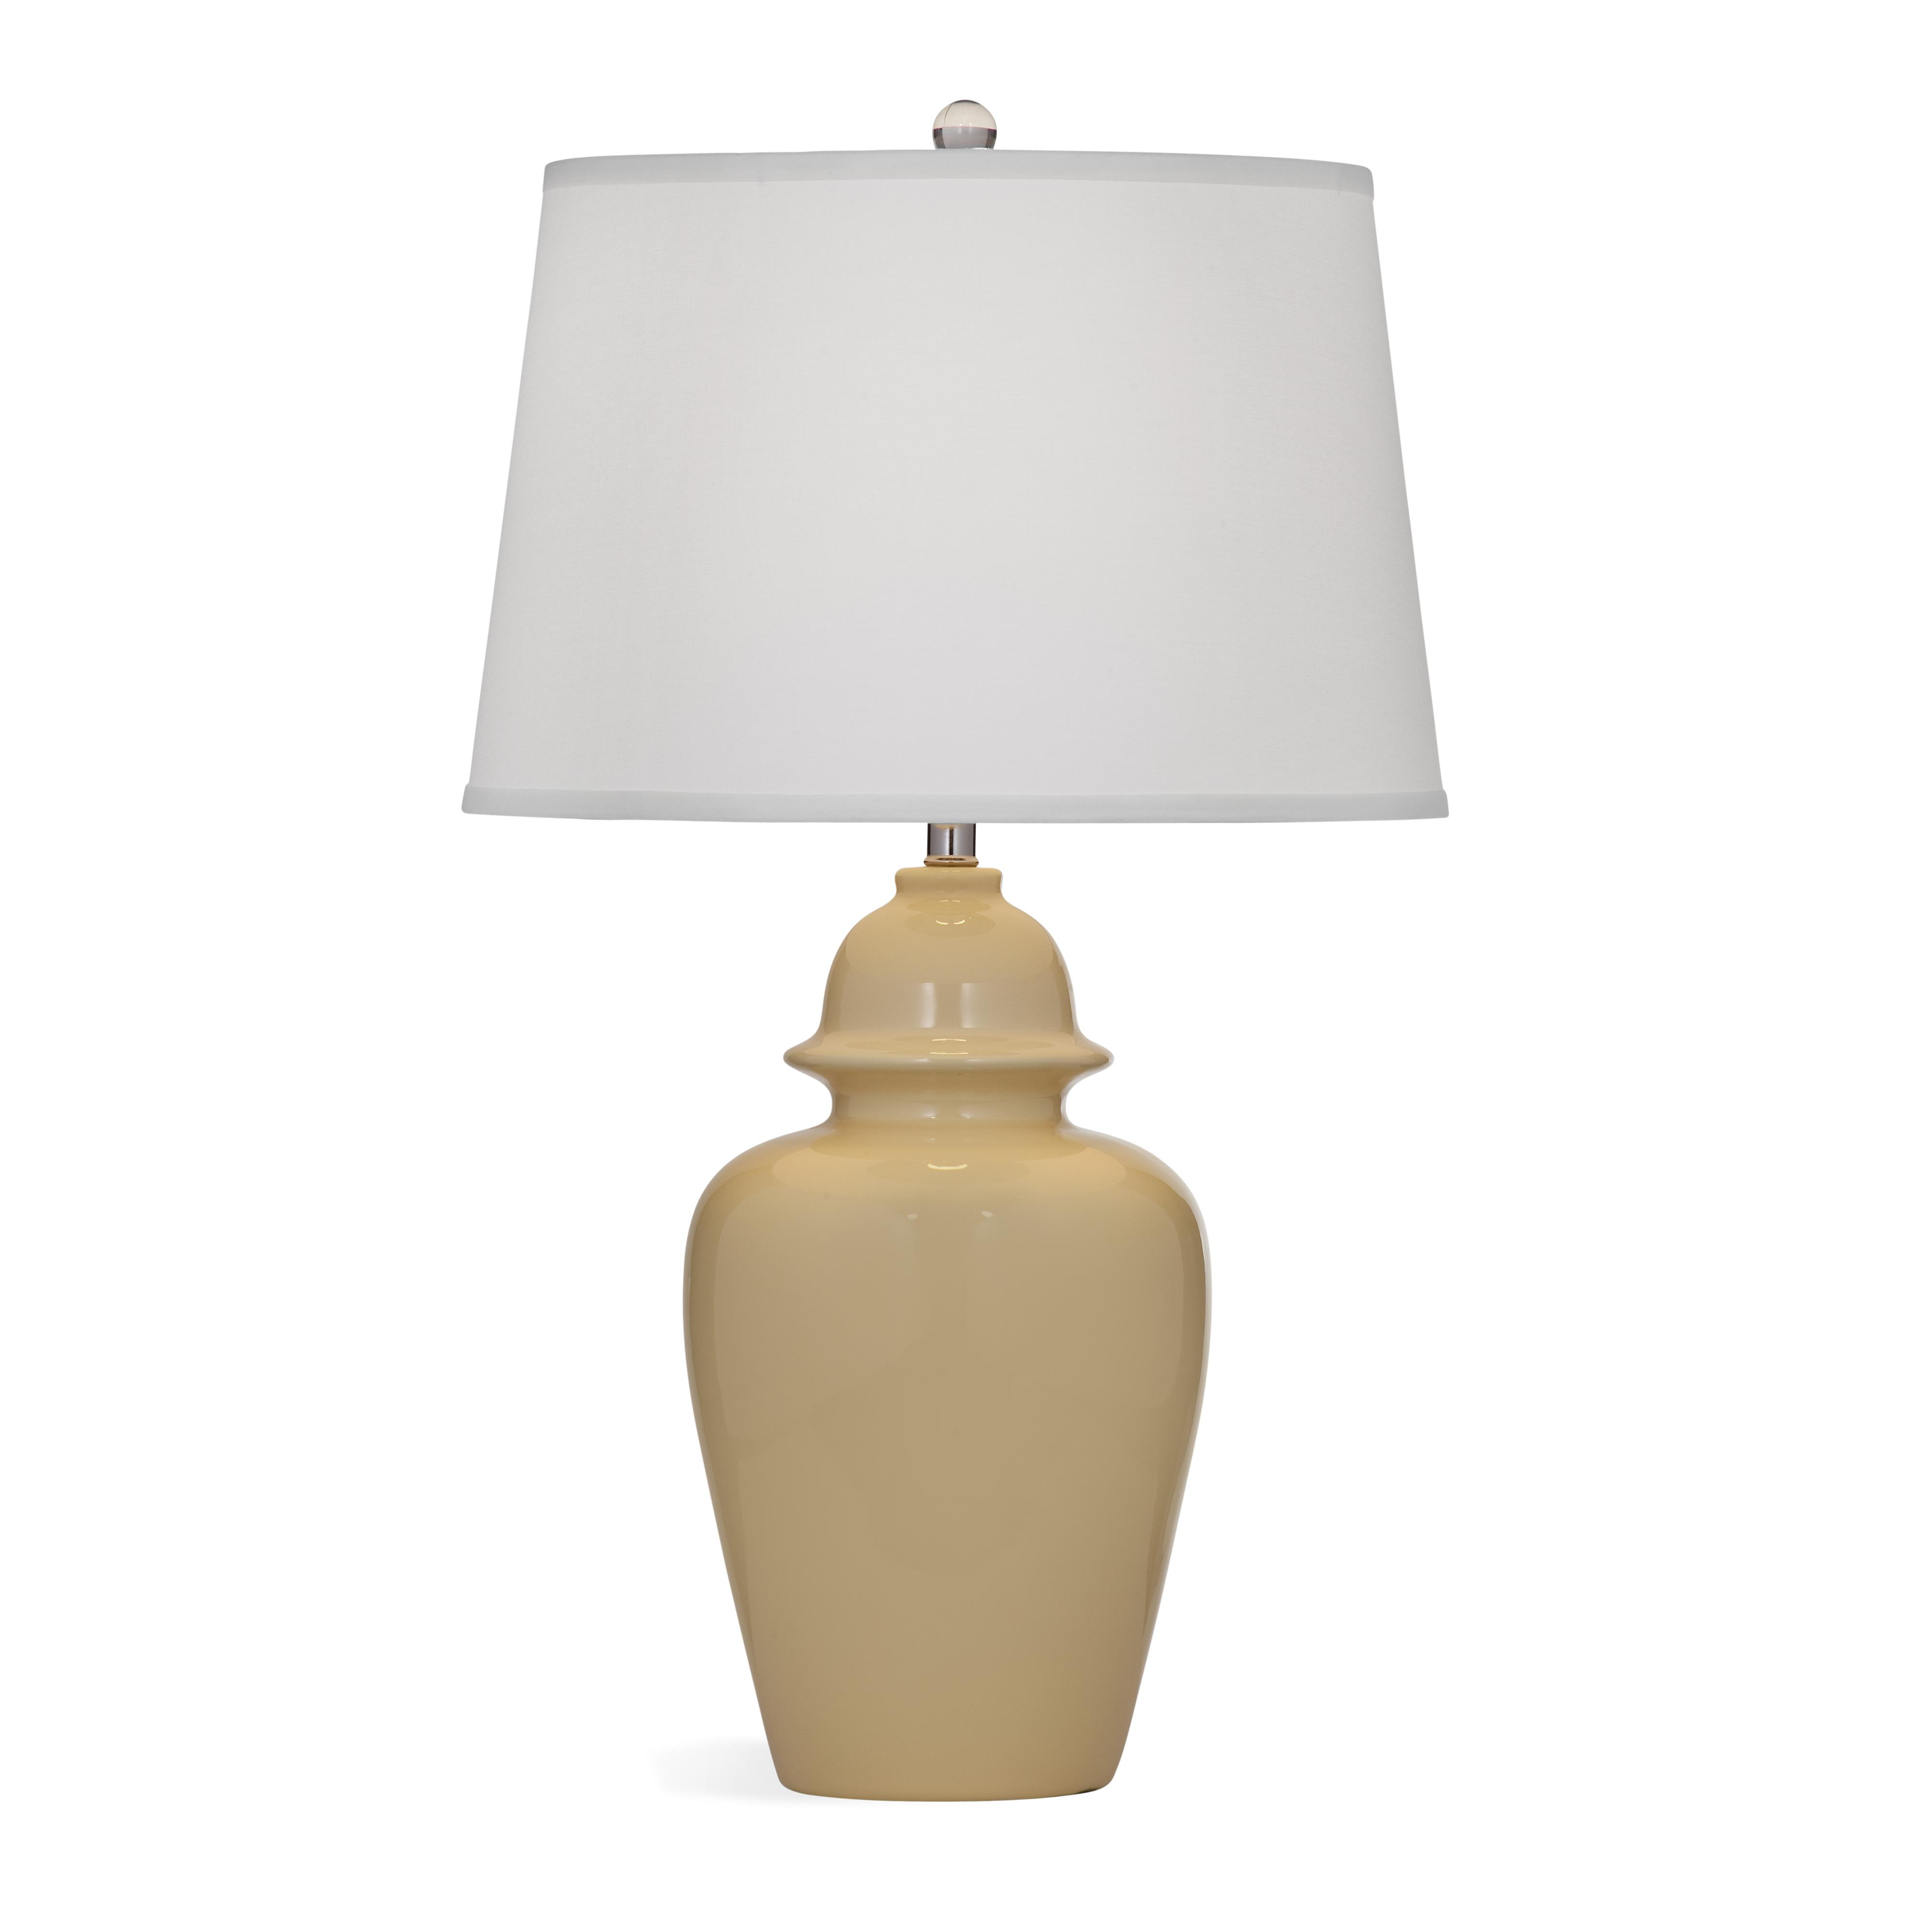 Wynne Table Lamp